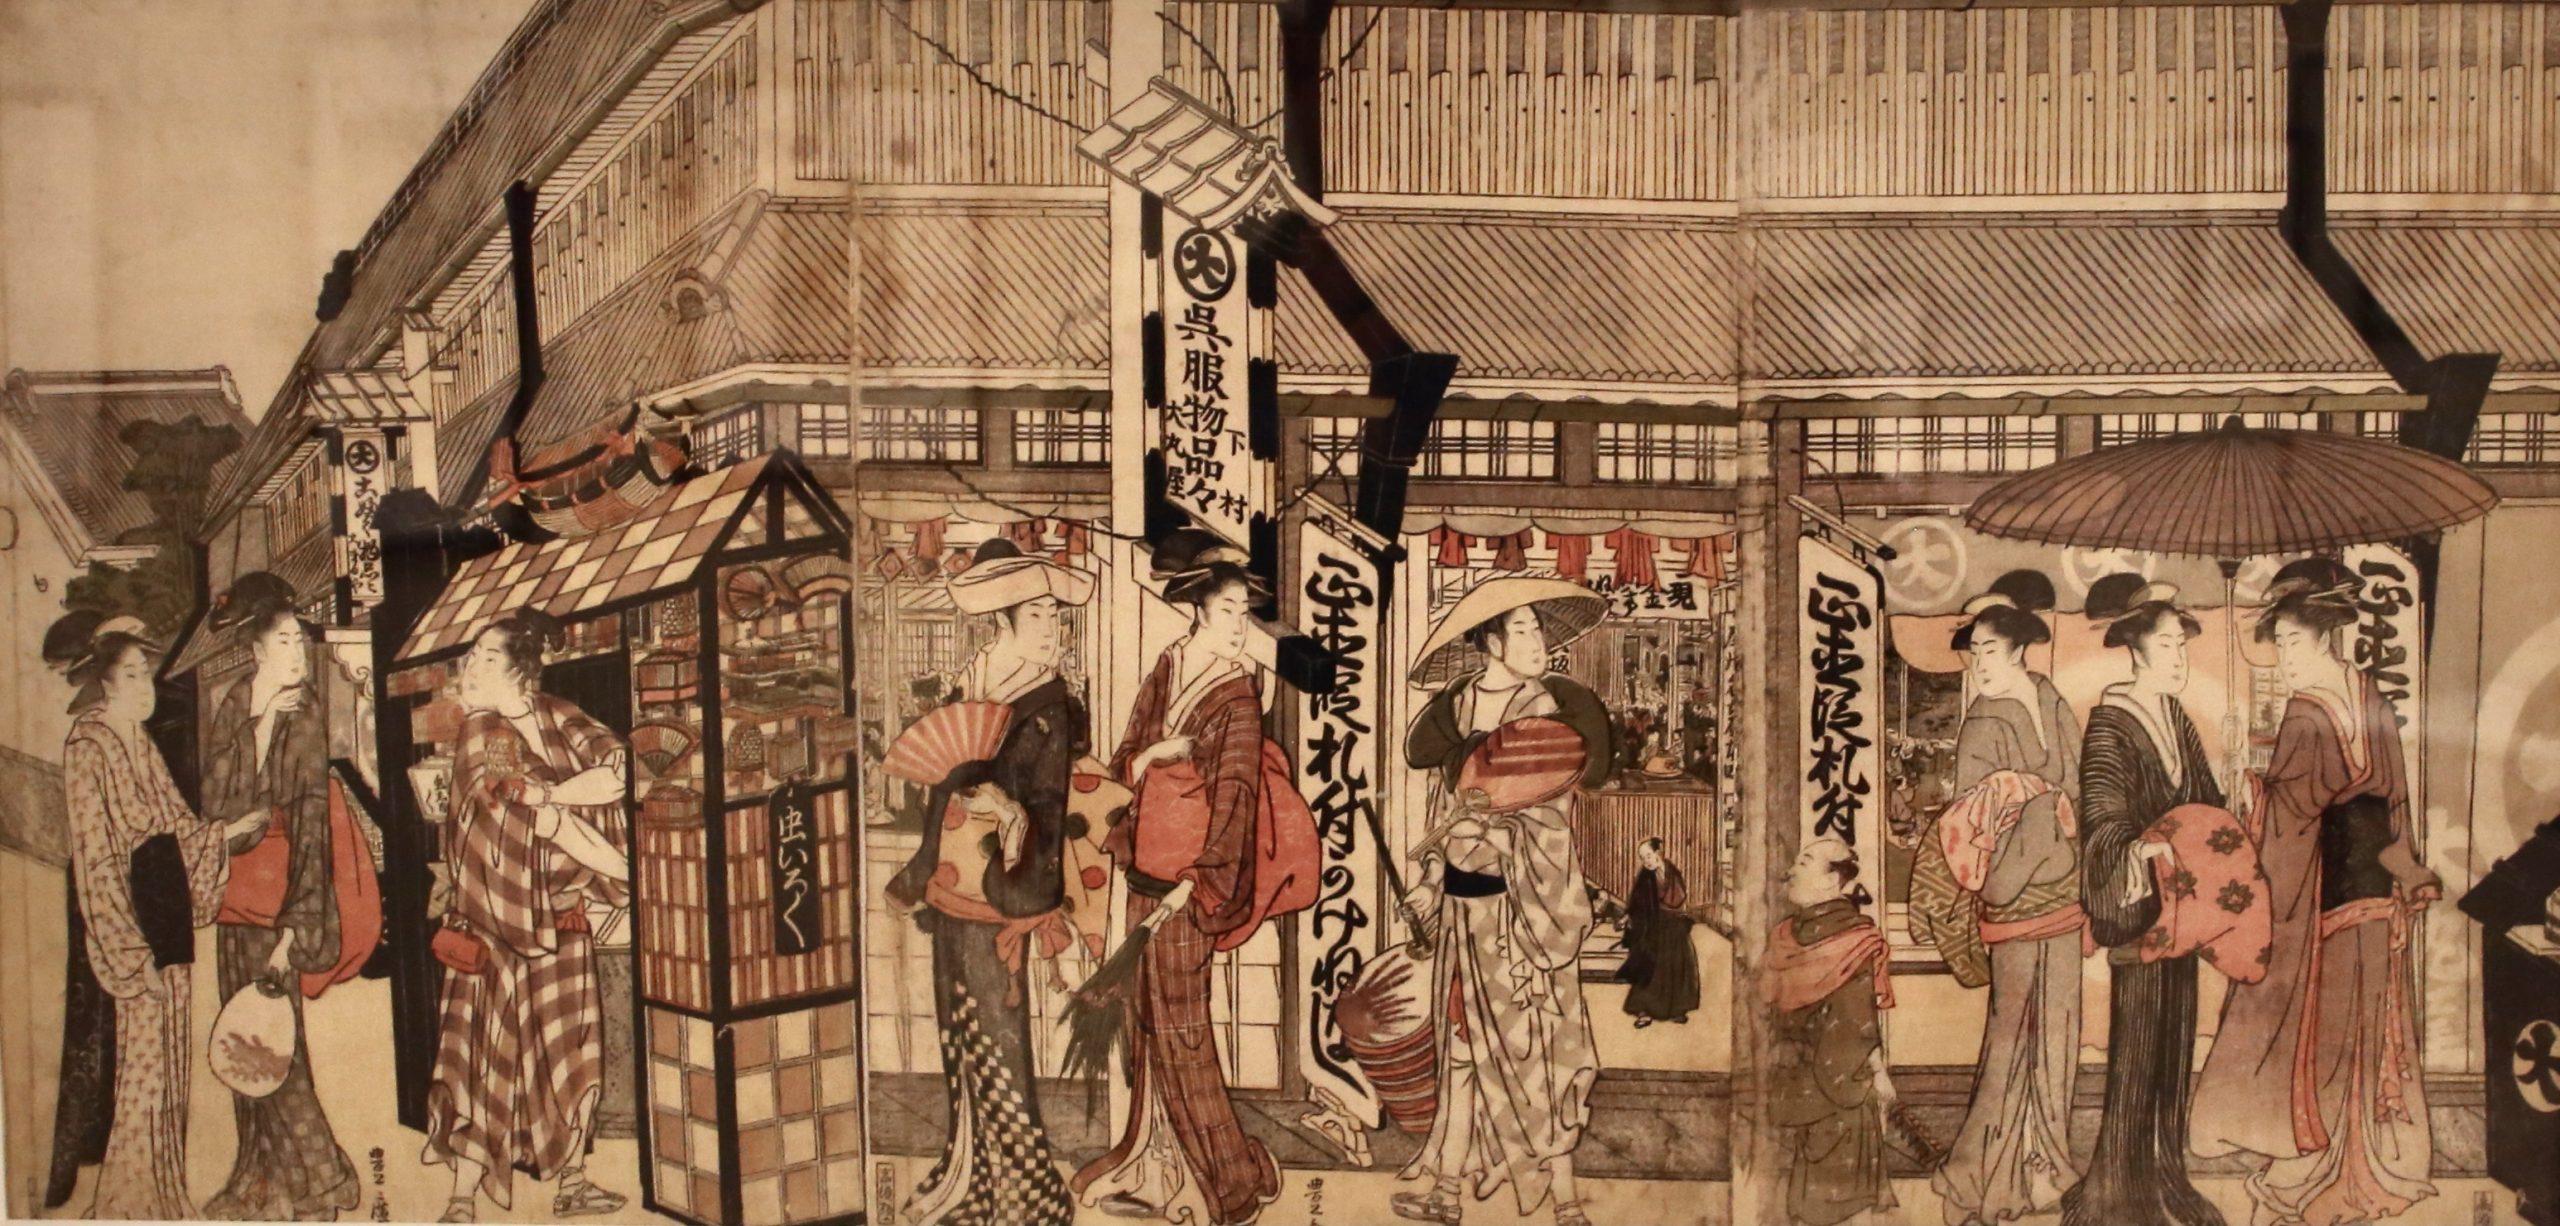 The Daimaruya Shop, Edo (1773-7828) Utagawa Toyohiro  Woodblock colour print Japanese Prints (Ukiyoe)